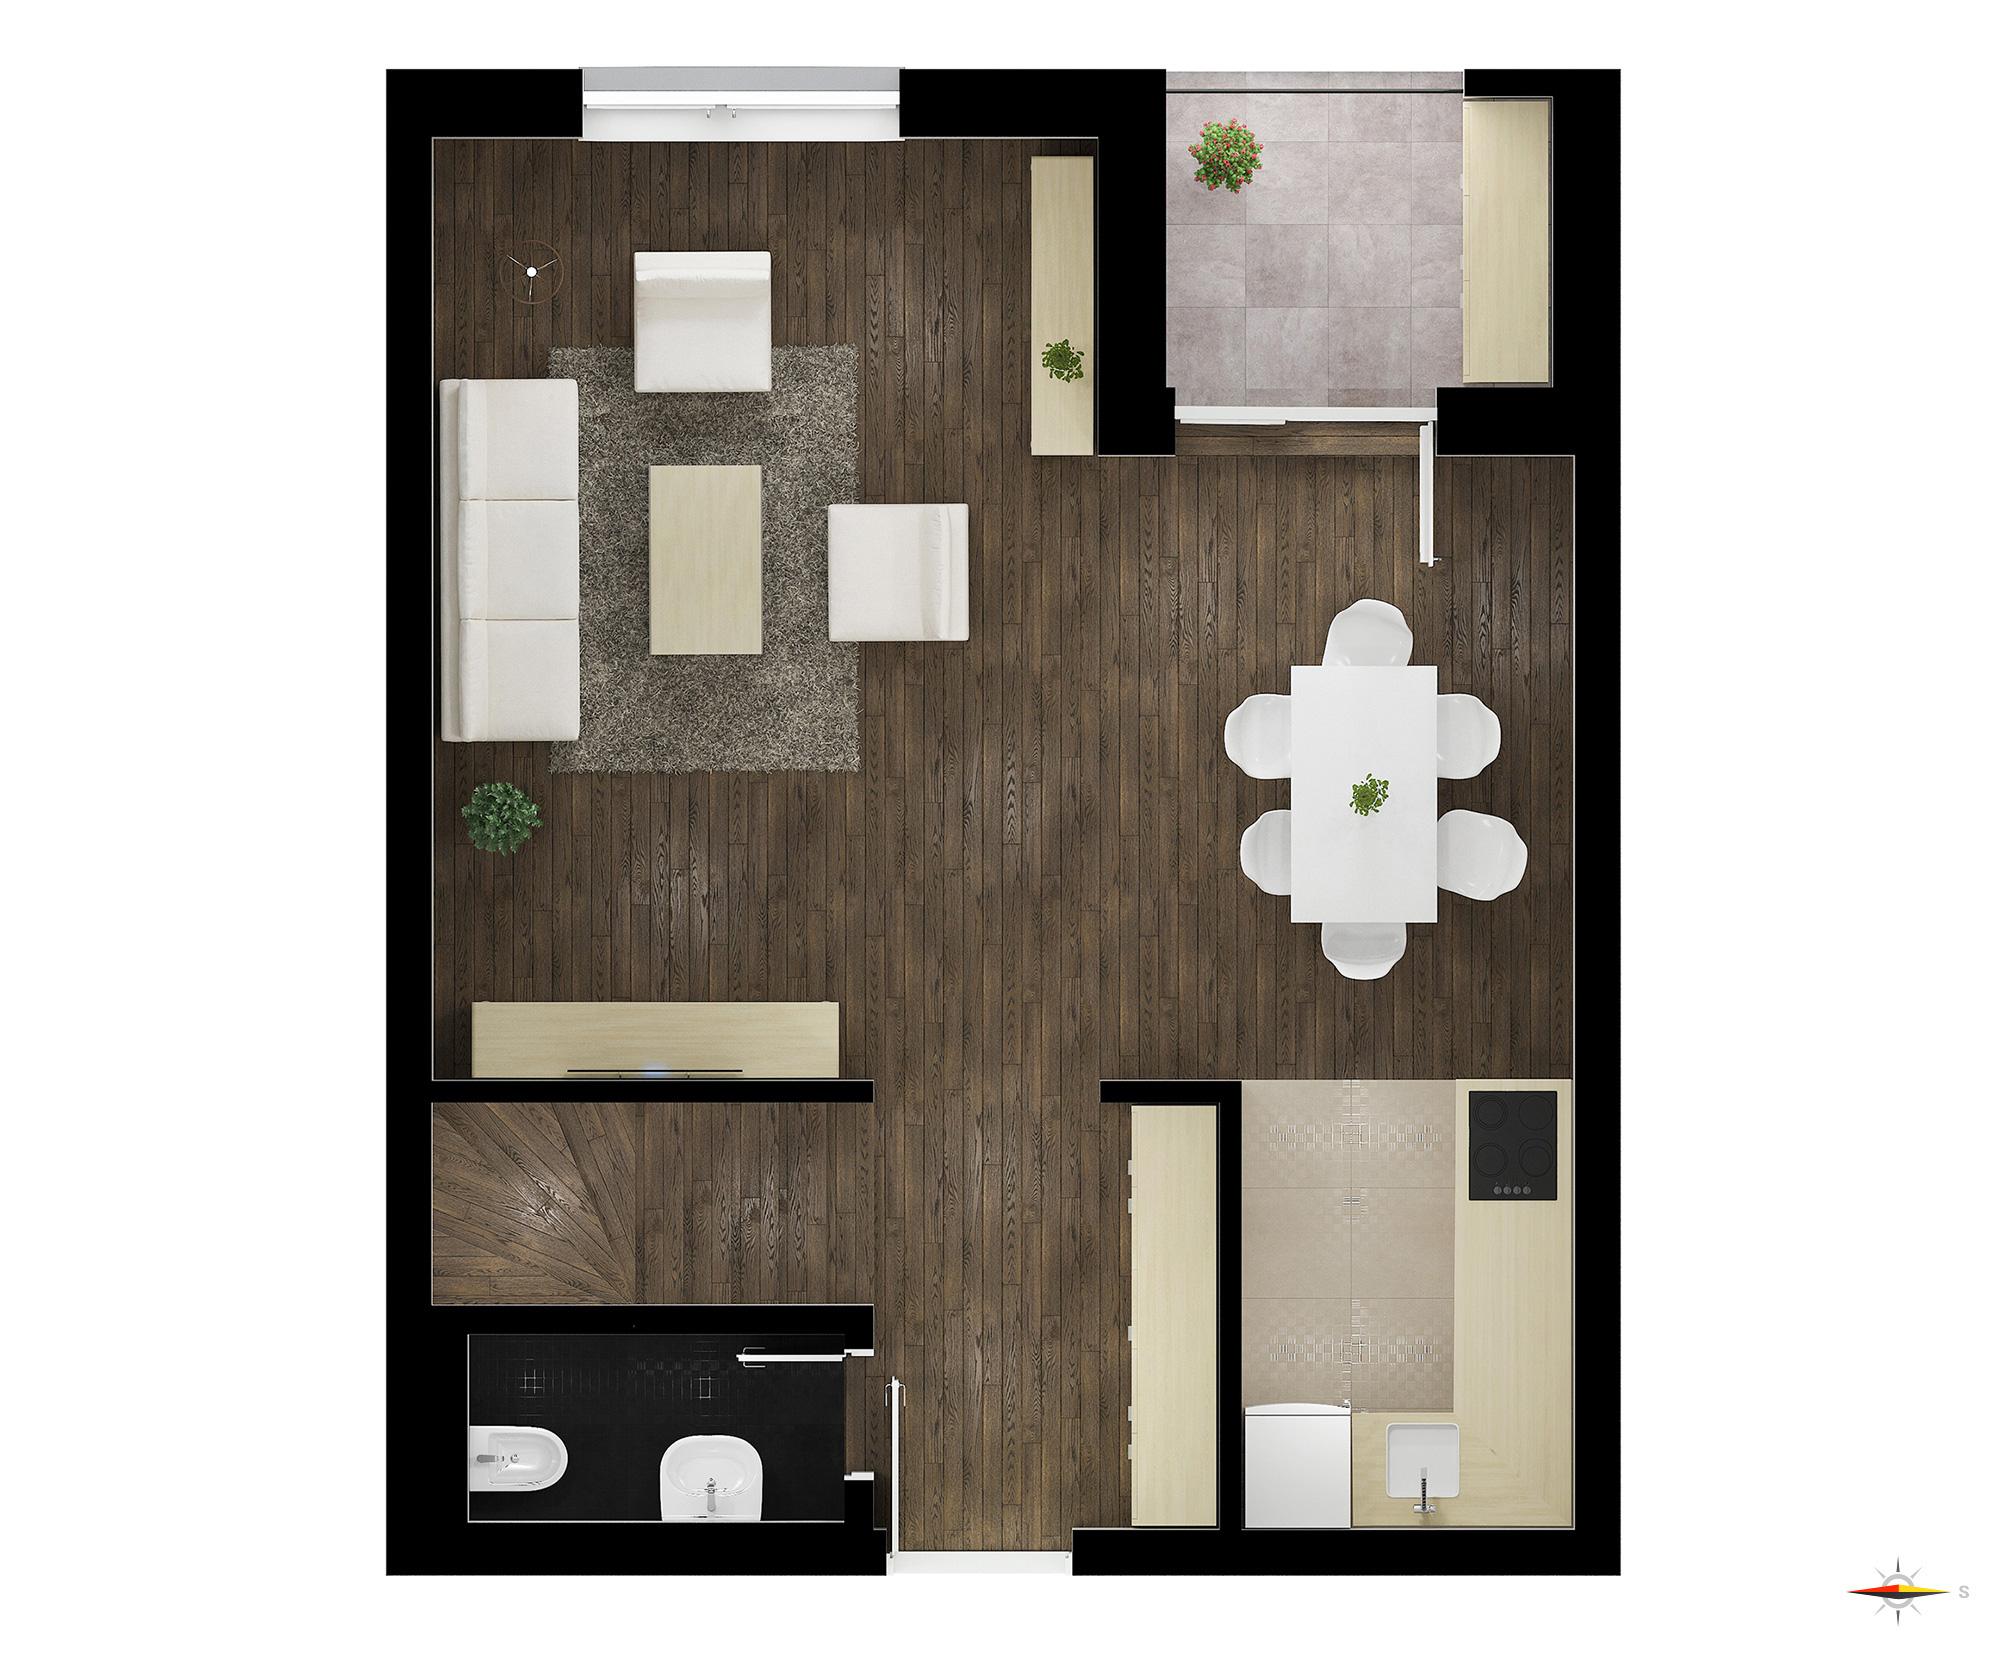 Četvorosoban stan (Dupleks) / TIP 3